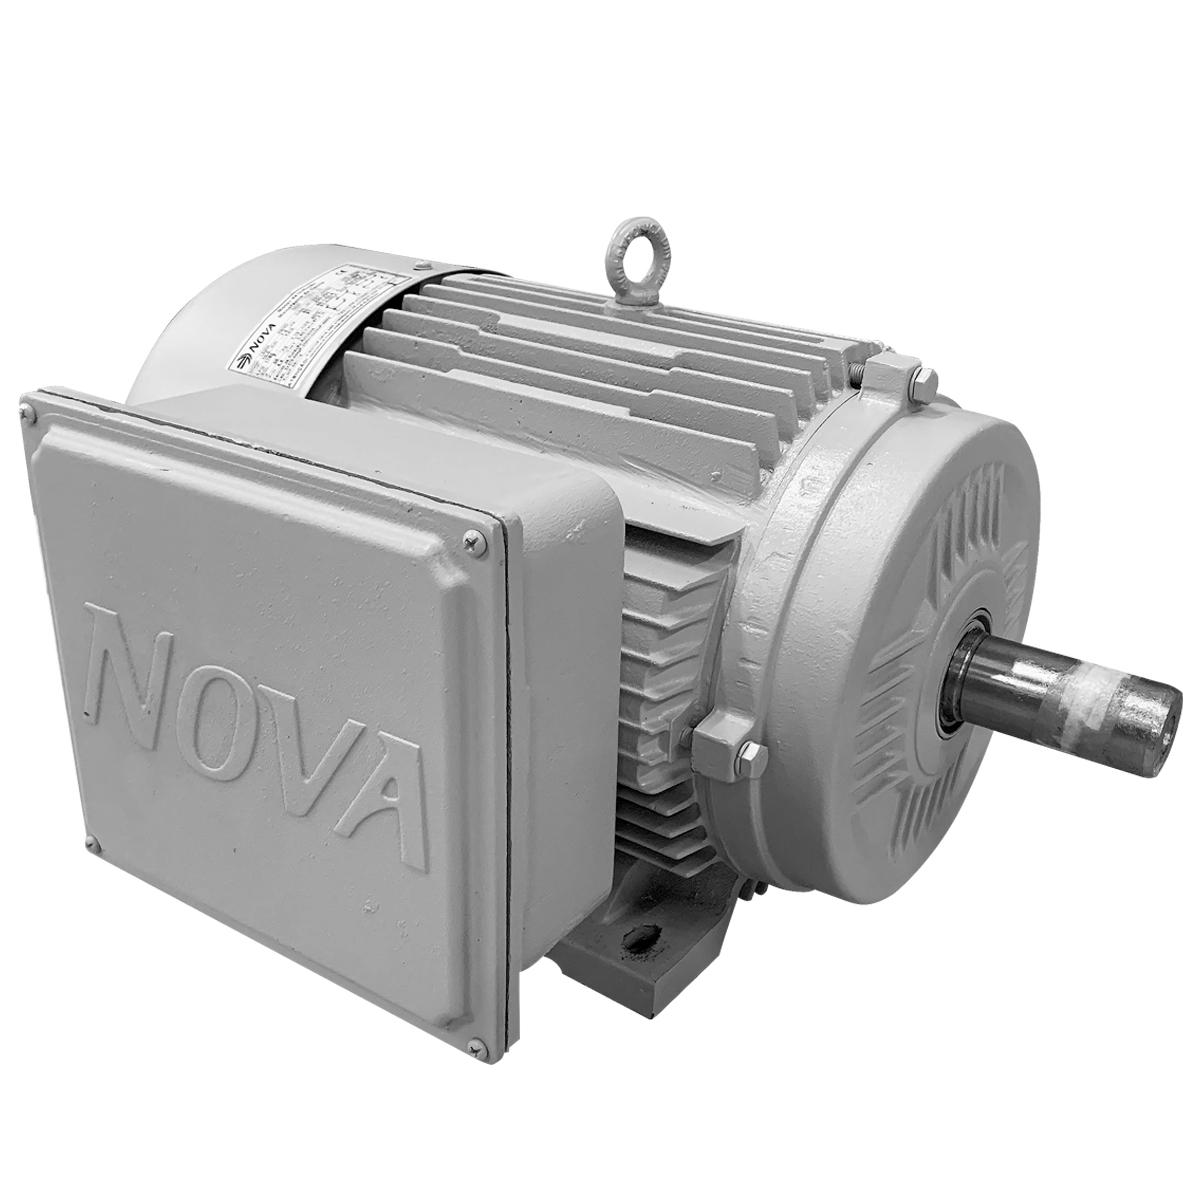 Motor Elétrico Blindado 7,5cv 4polo Monofasico Baixa Rotação Carcaça 132